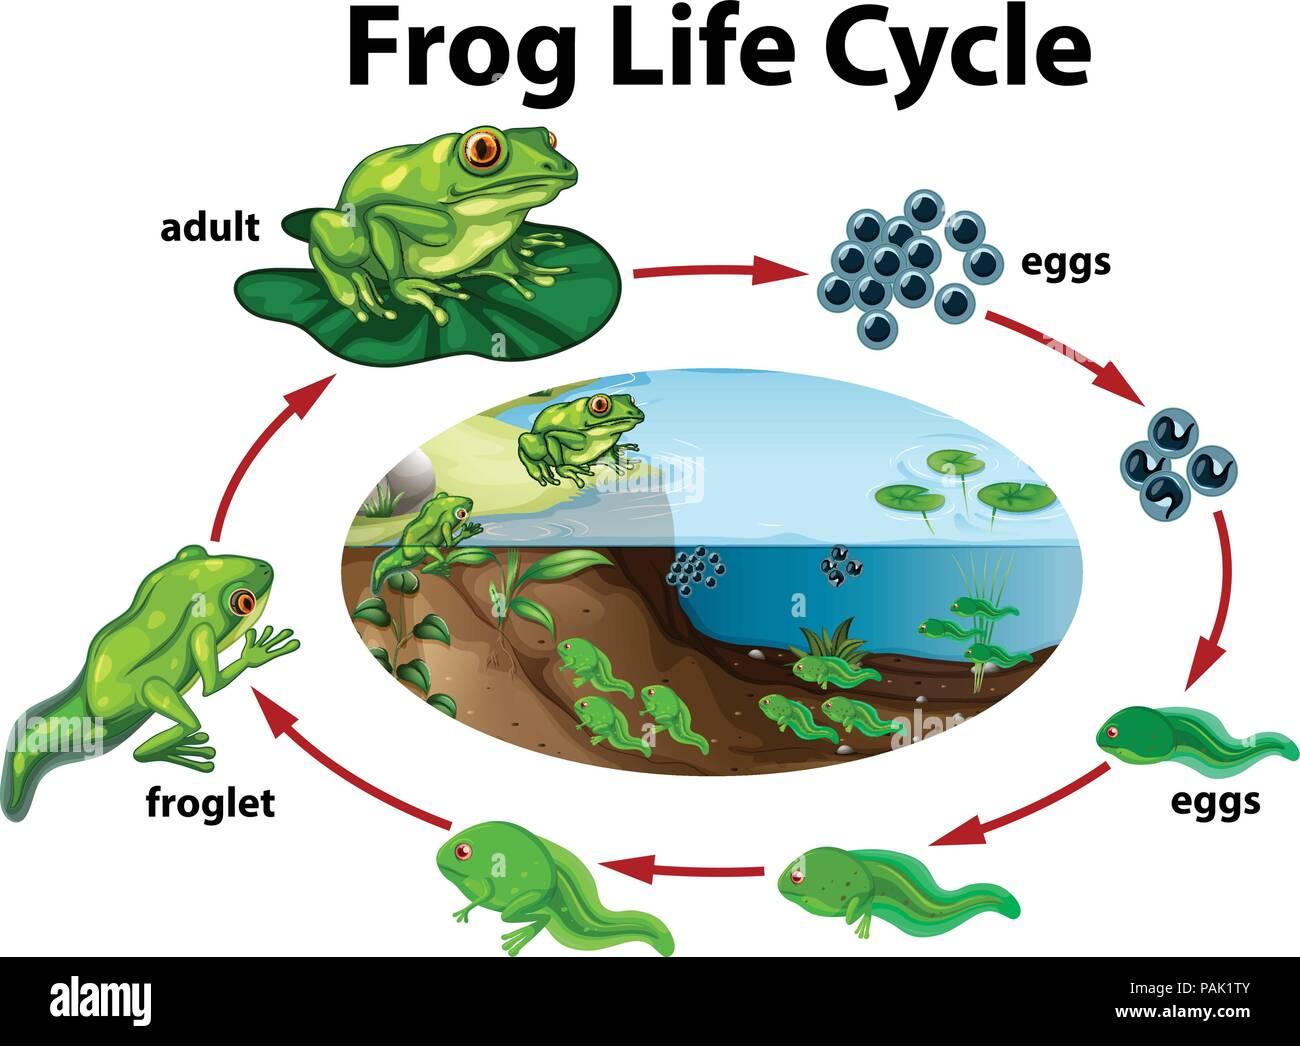 Ein Frosch Lebenszyklus Abbildung Stock Vektorgrafik   Alamy